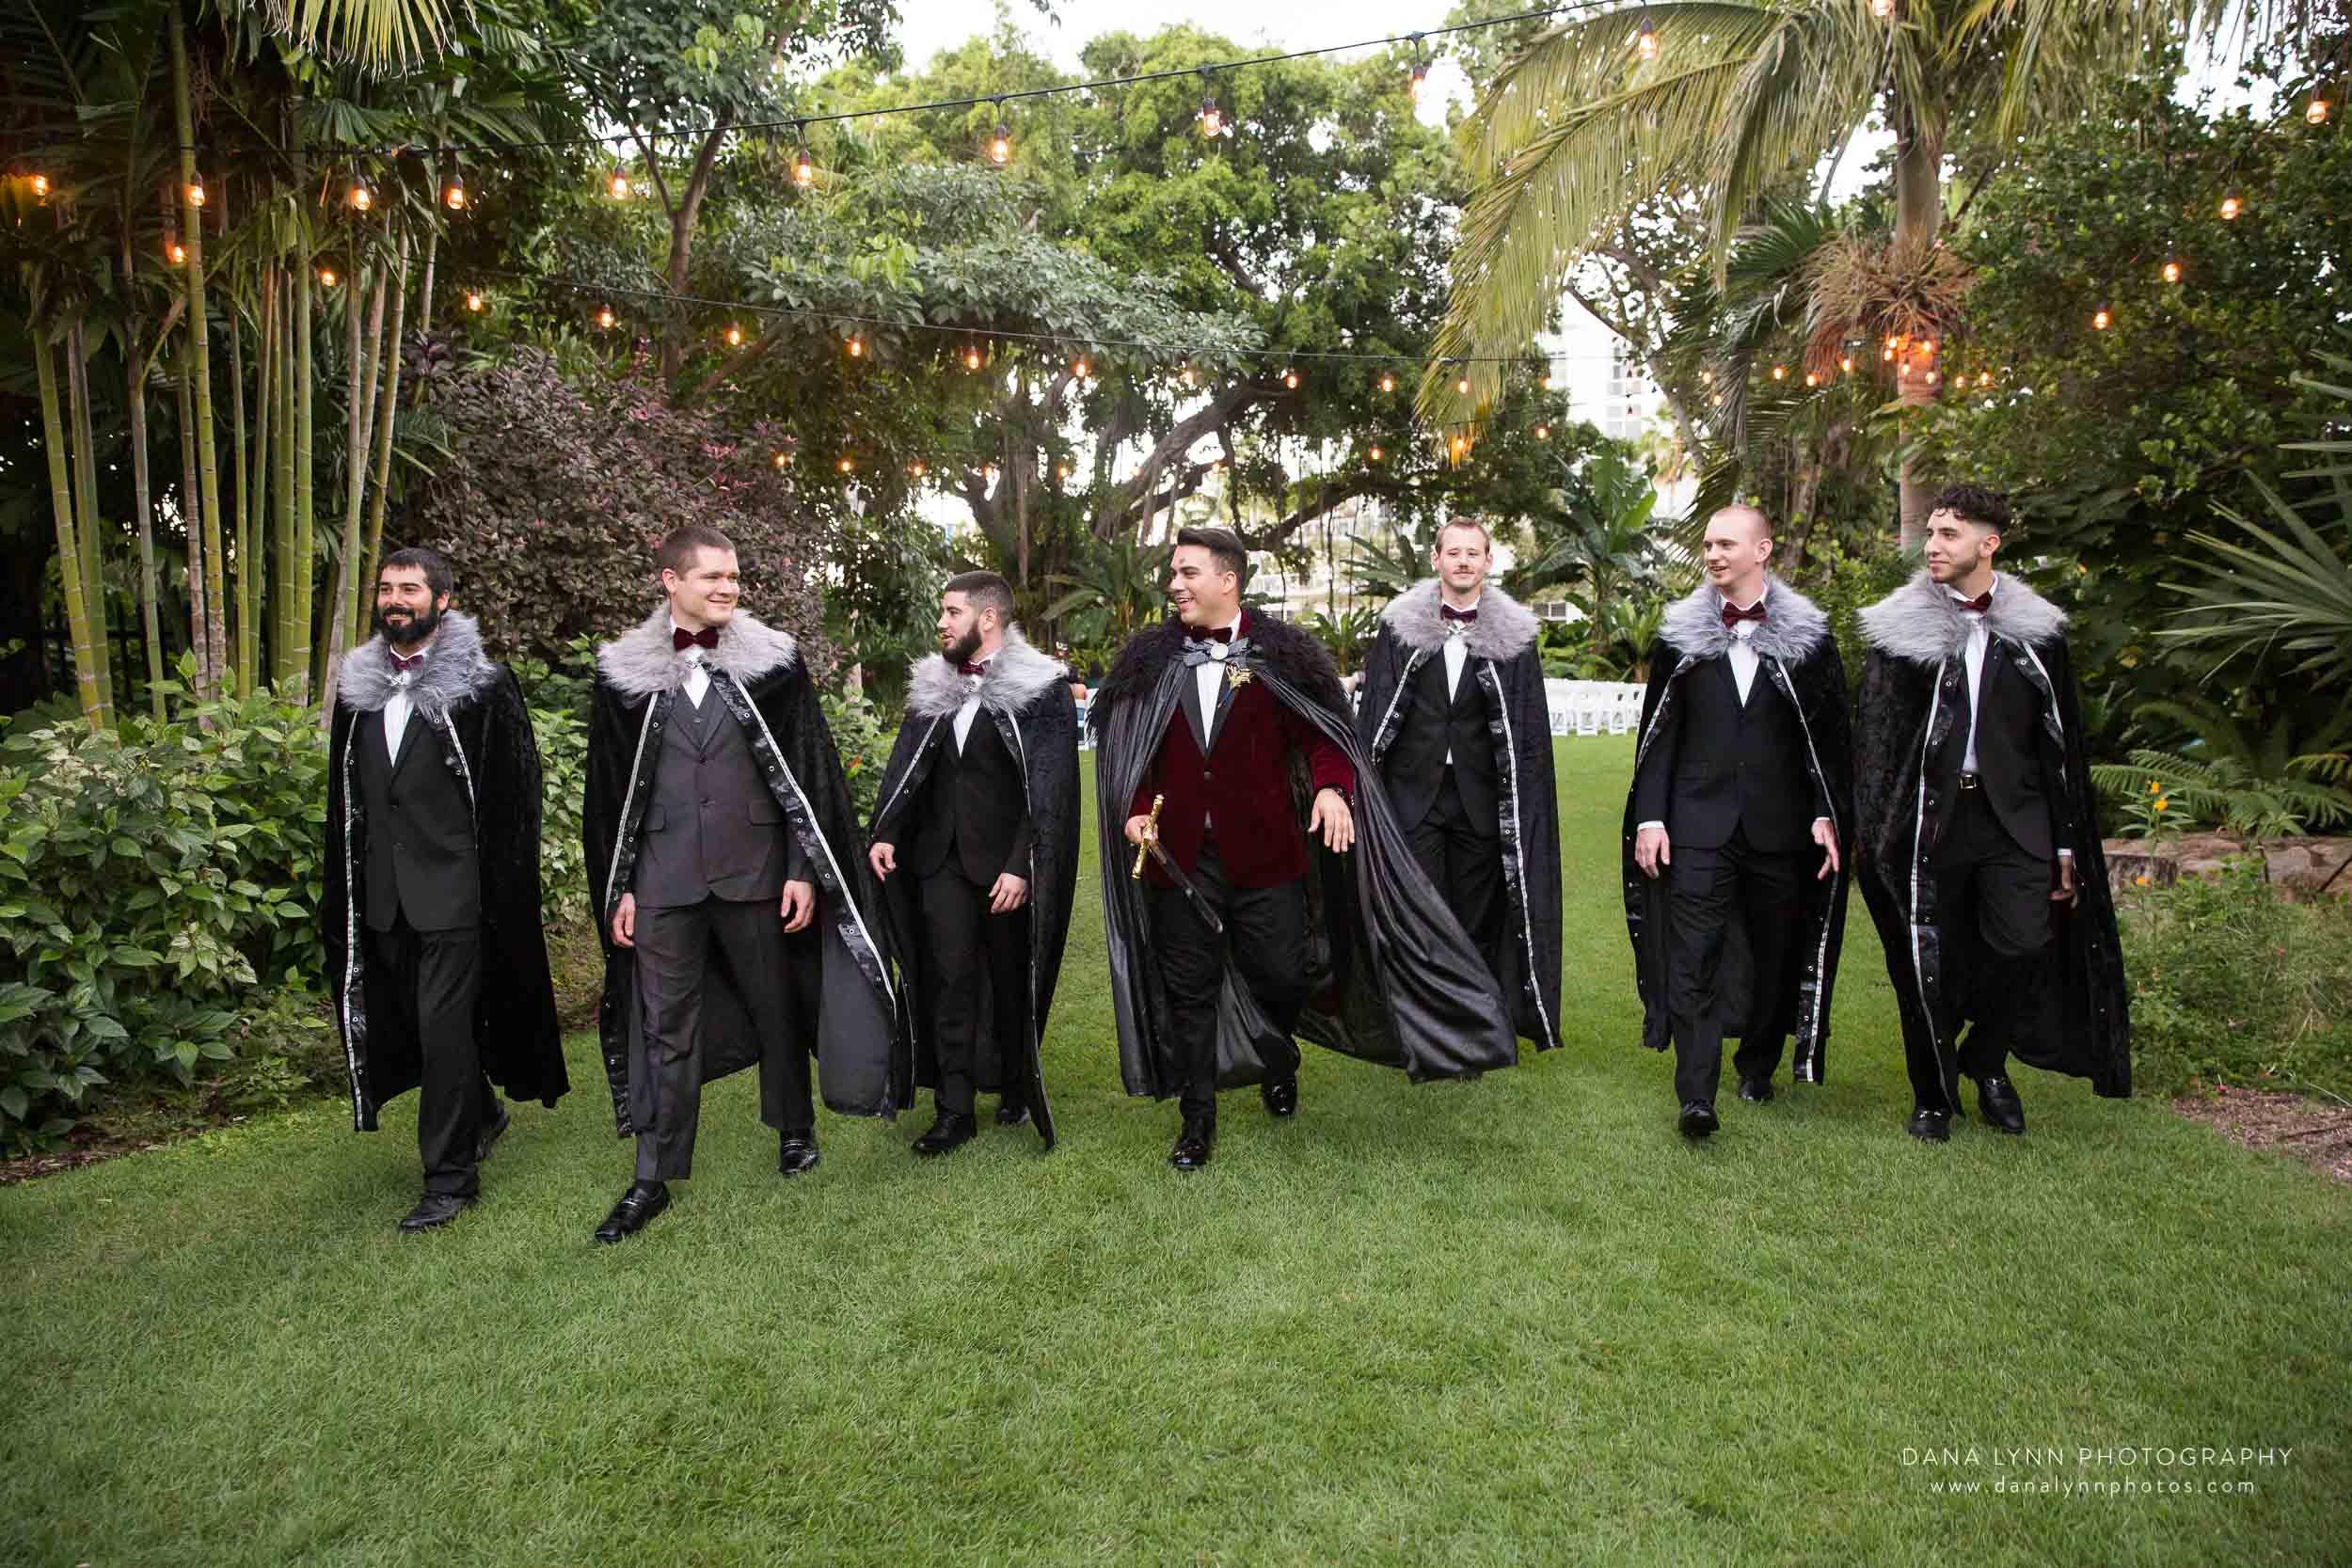 game-of-thrones-wedding-0002.jpg